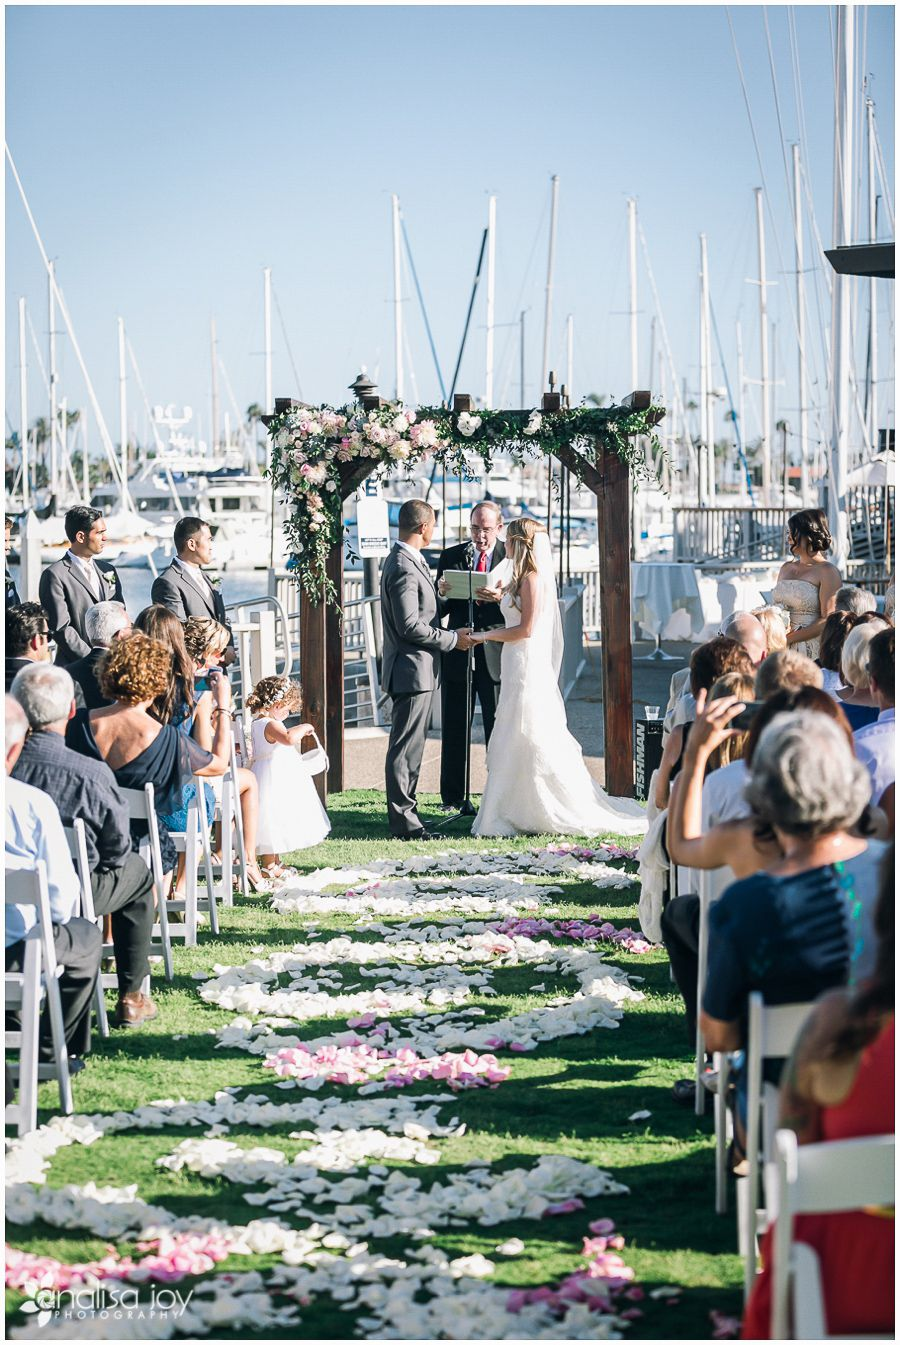 wedding justin sarah san diego yacht club ca analisa joy photography san diego ca photographe yacht wedding san diego photography yacht club wedding pinterest